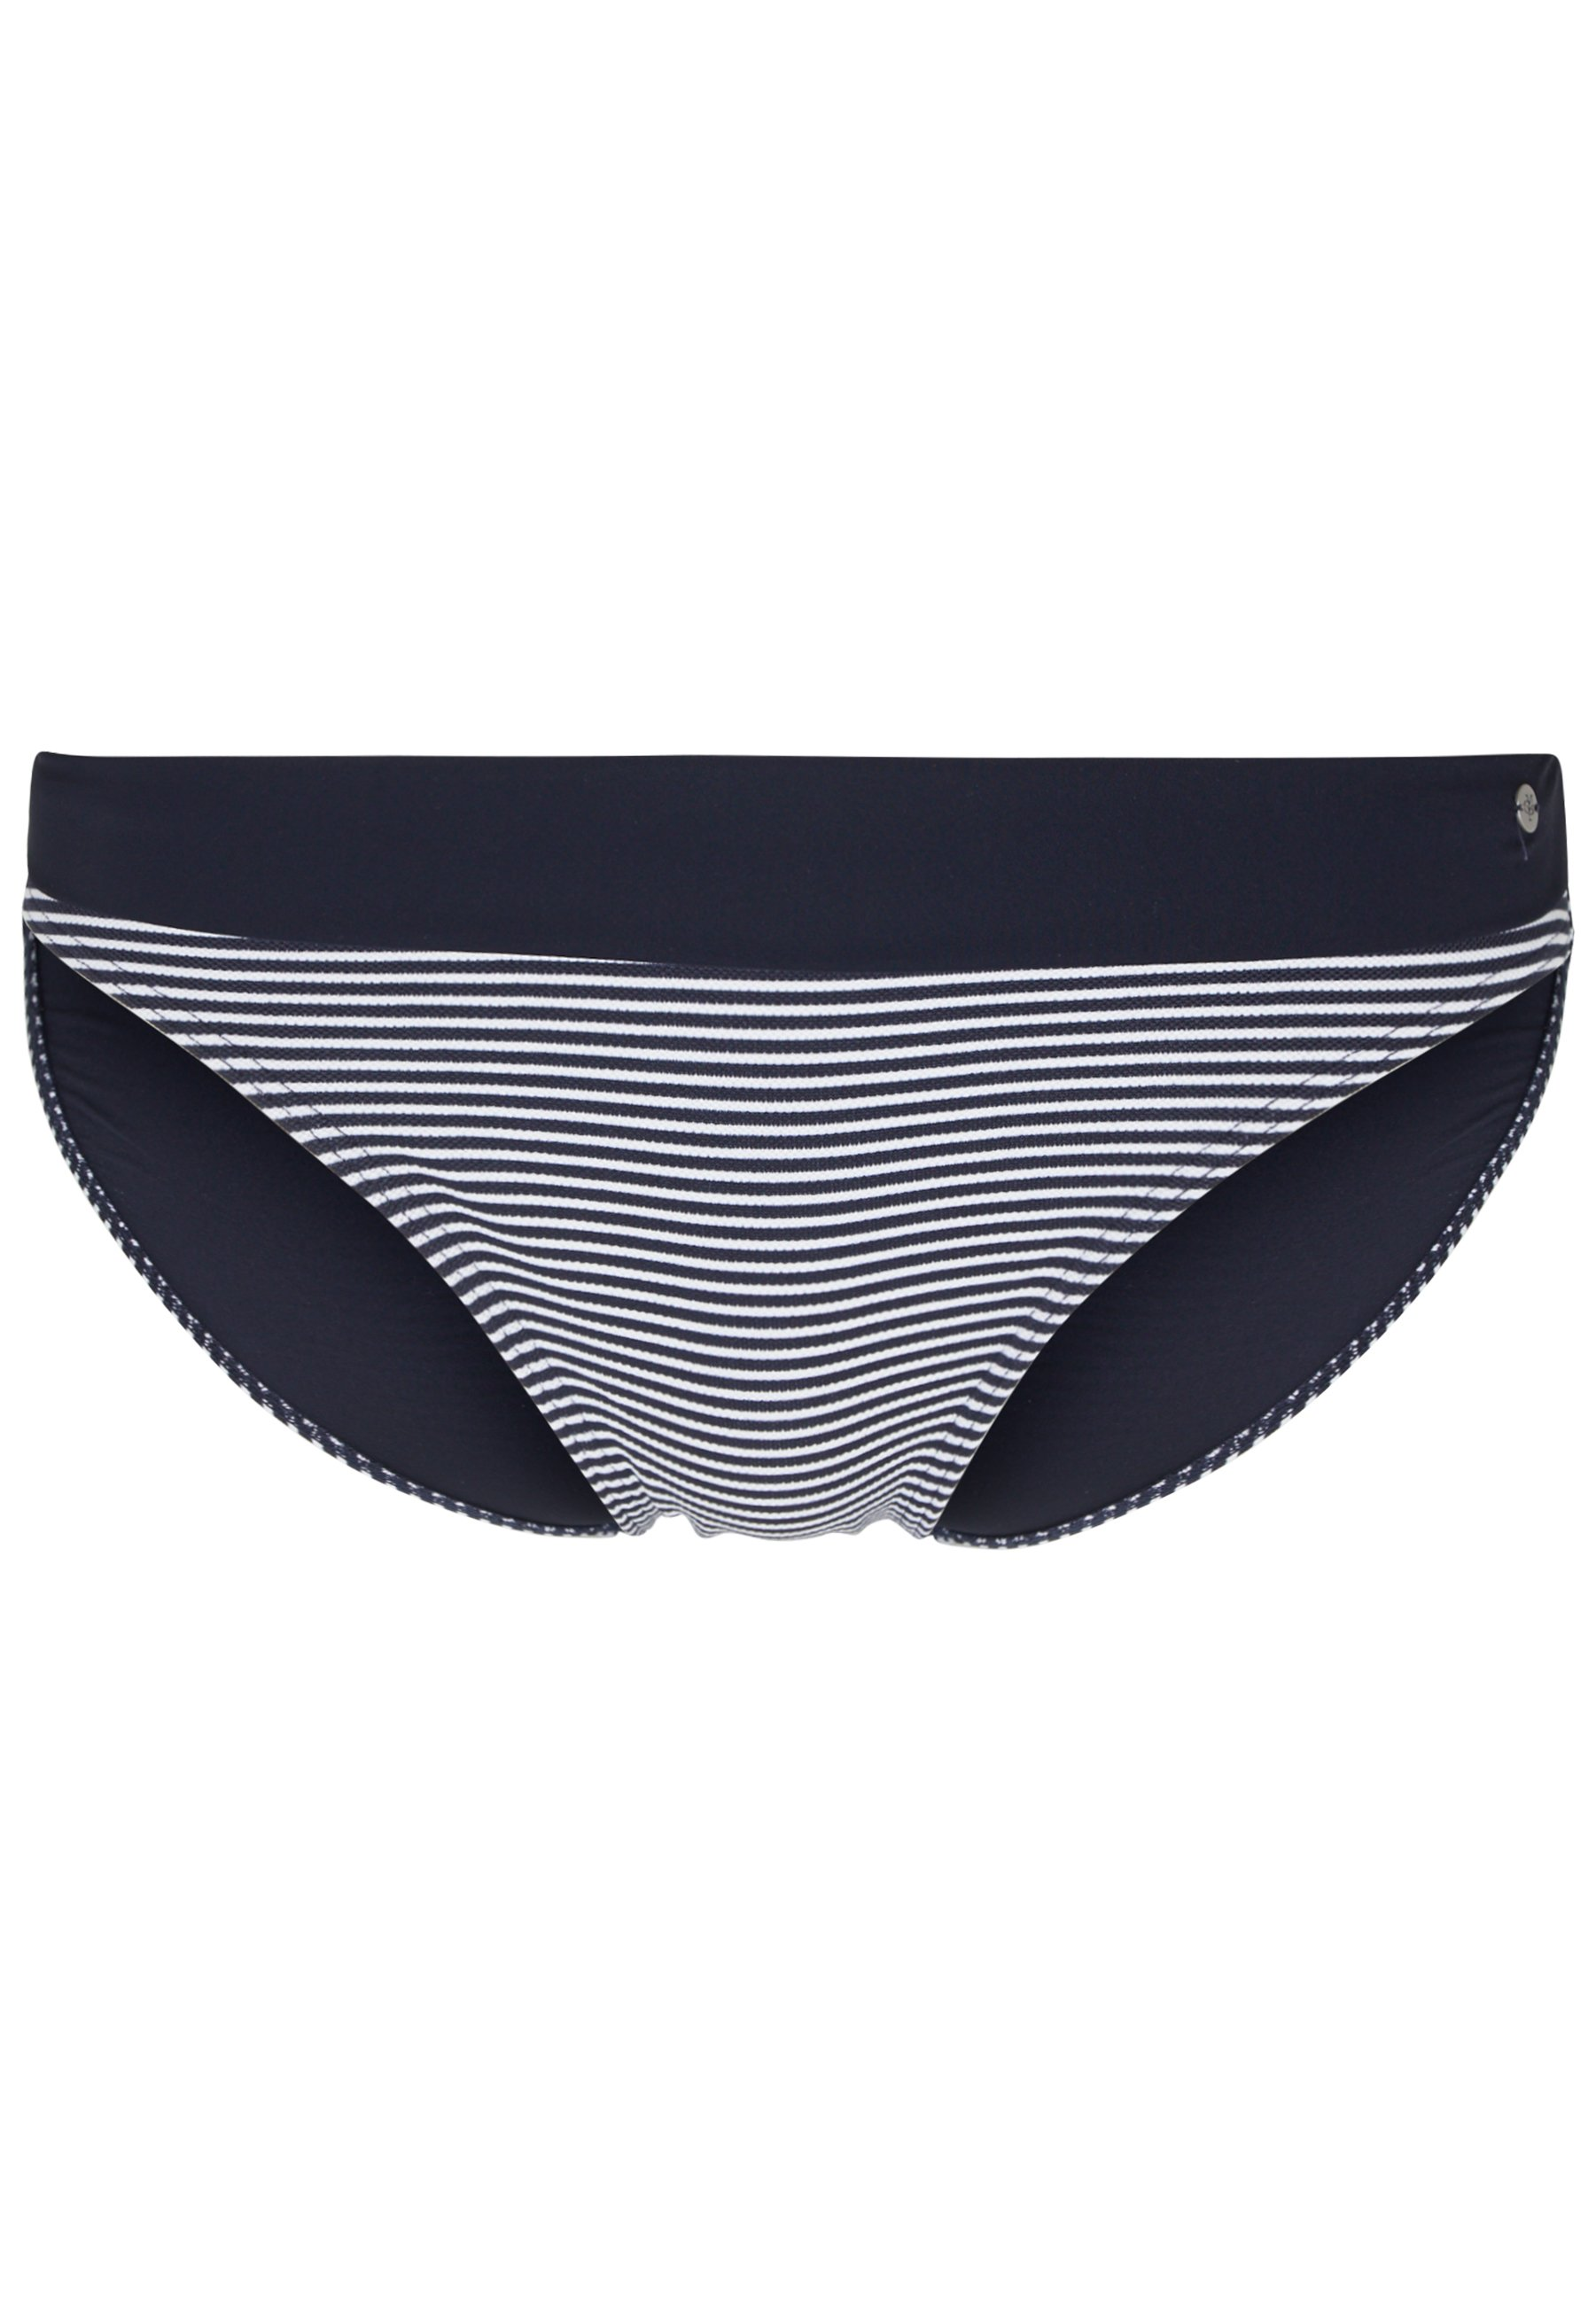 Marc O'polo Bikiniunderdel - Blauschwarz